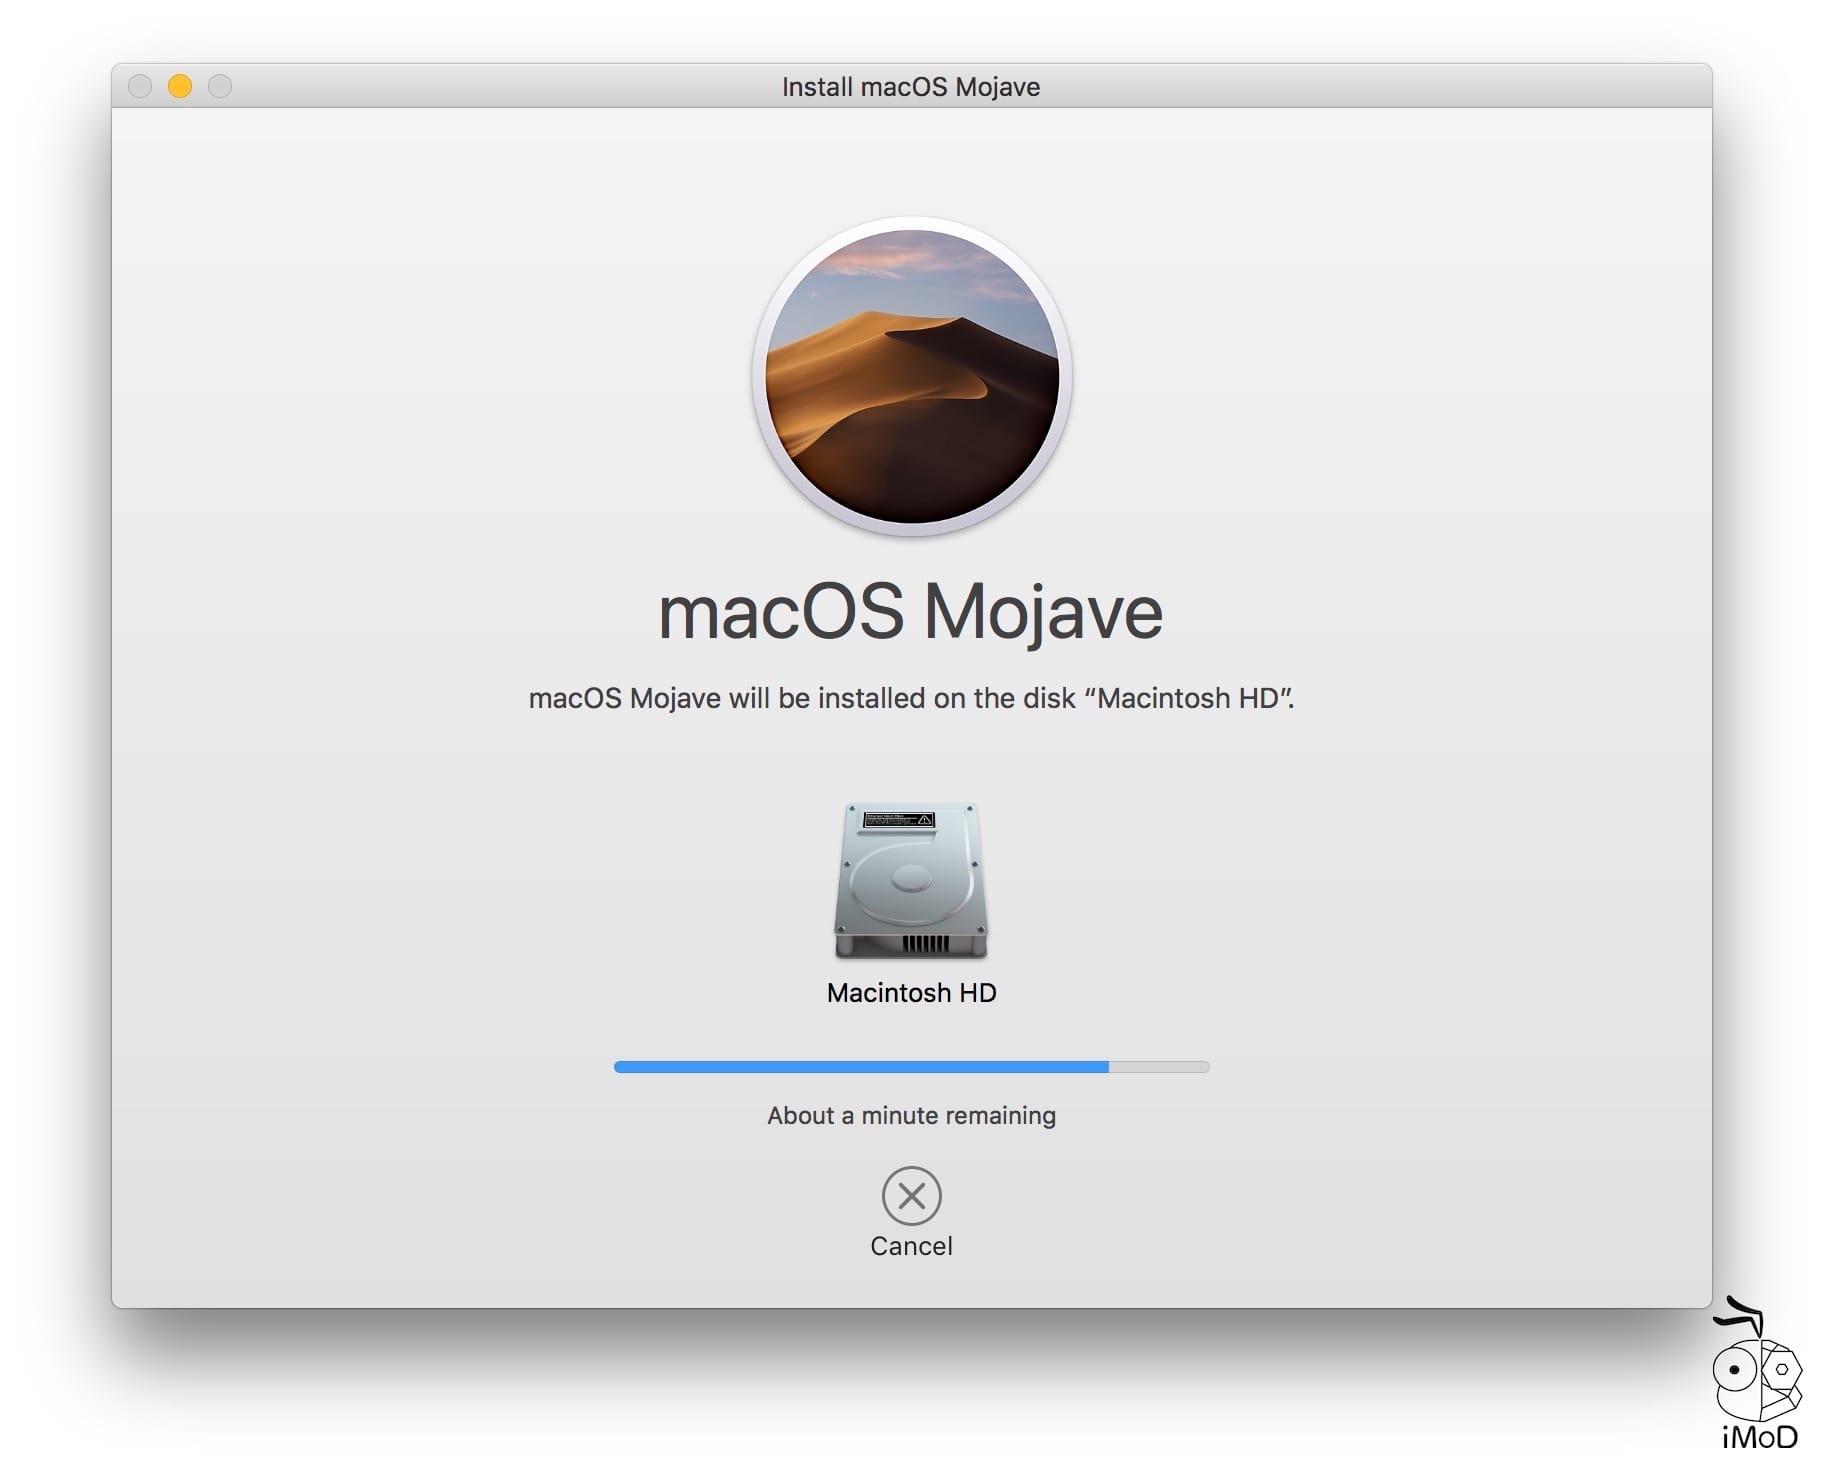 Install Macos Mojave Screenshot 2018 10 01 10.03.14